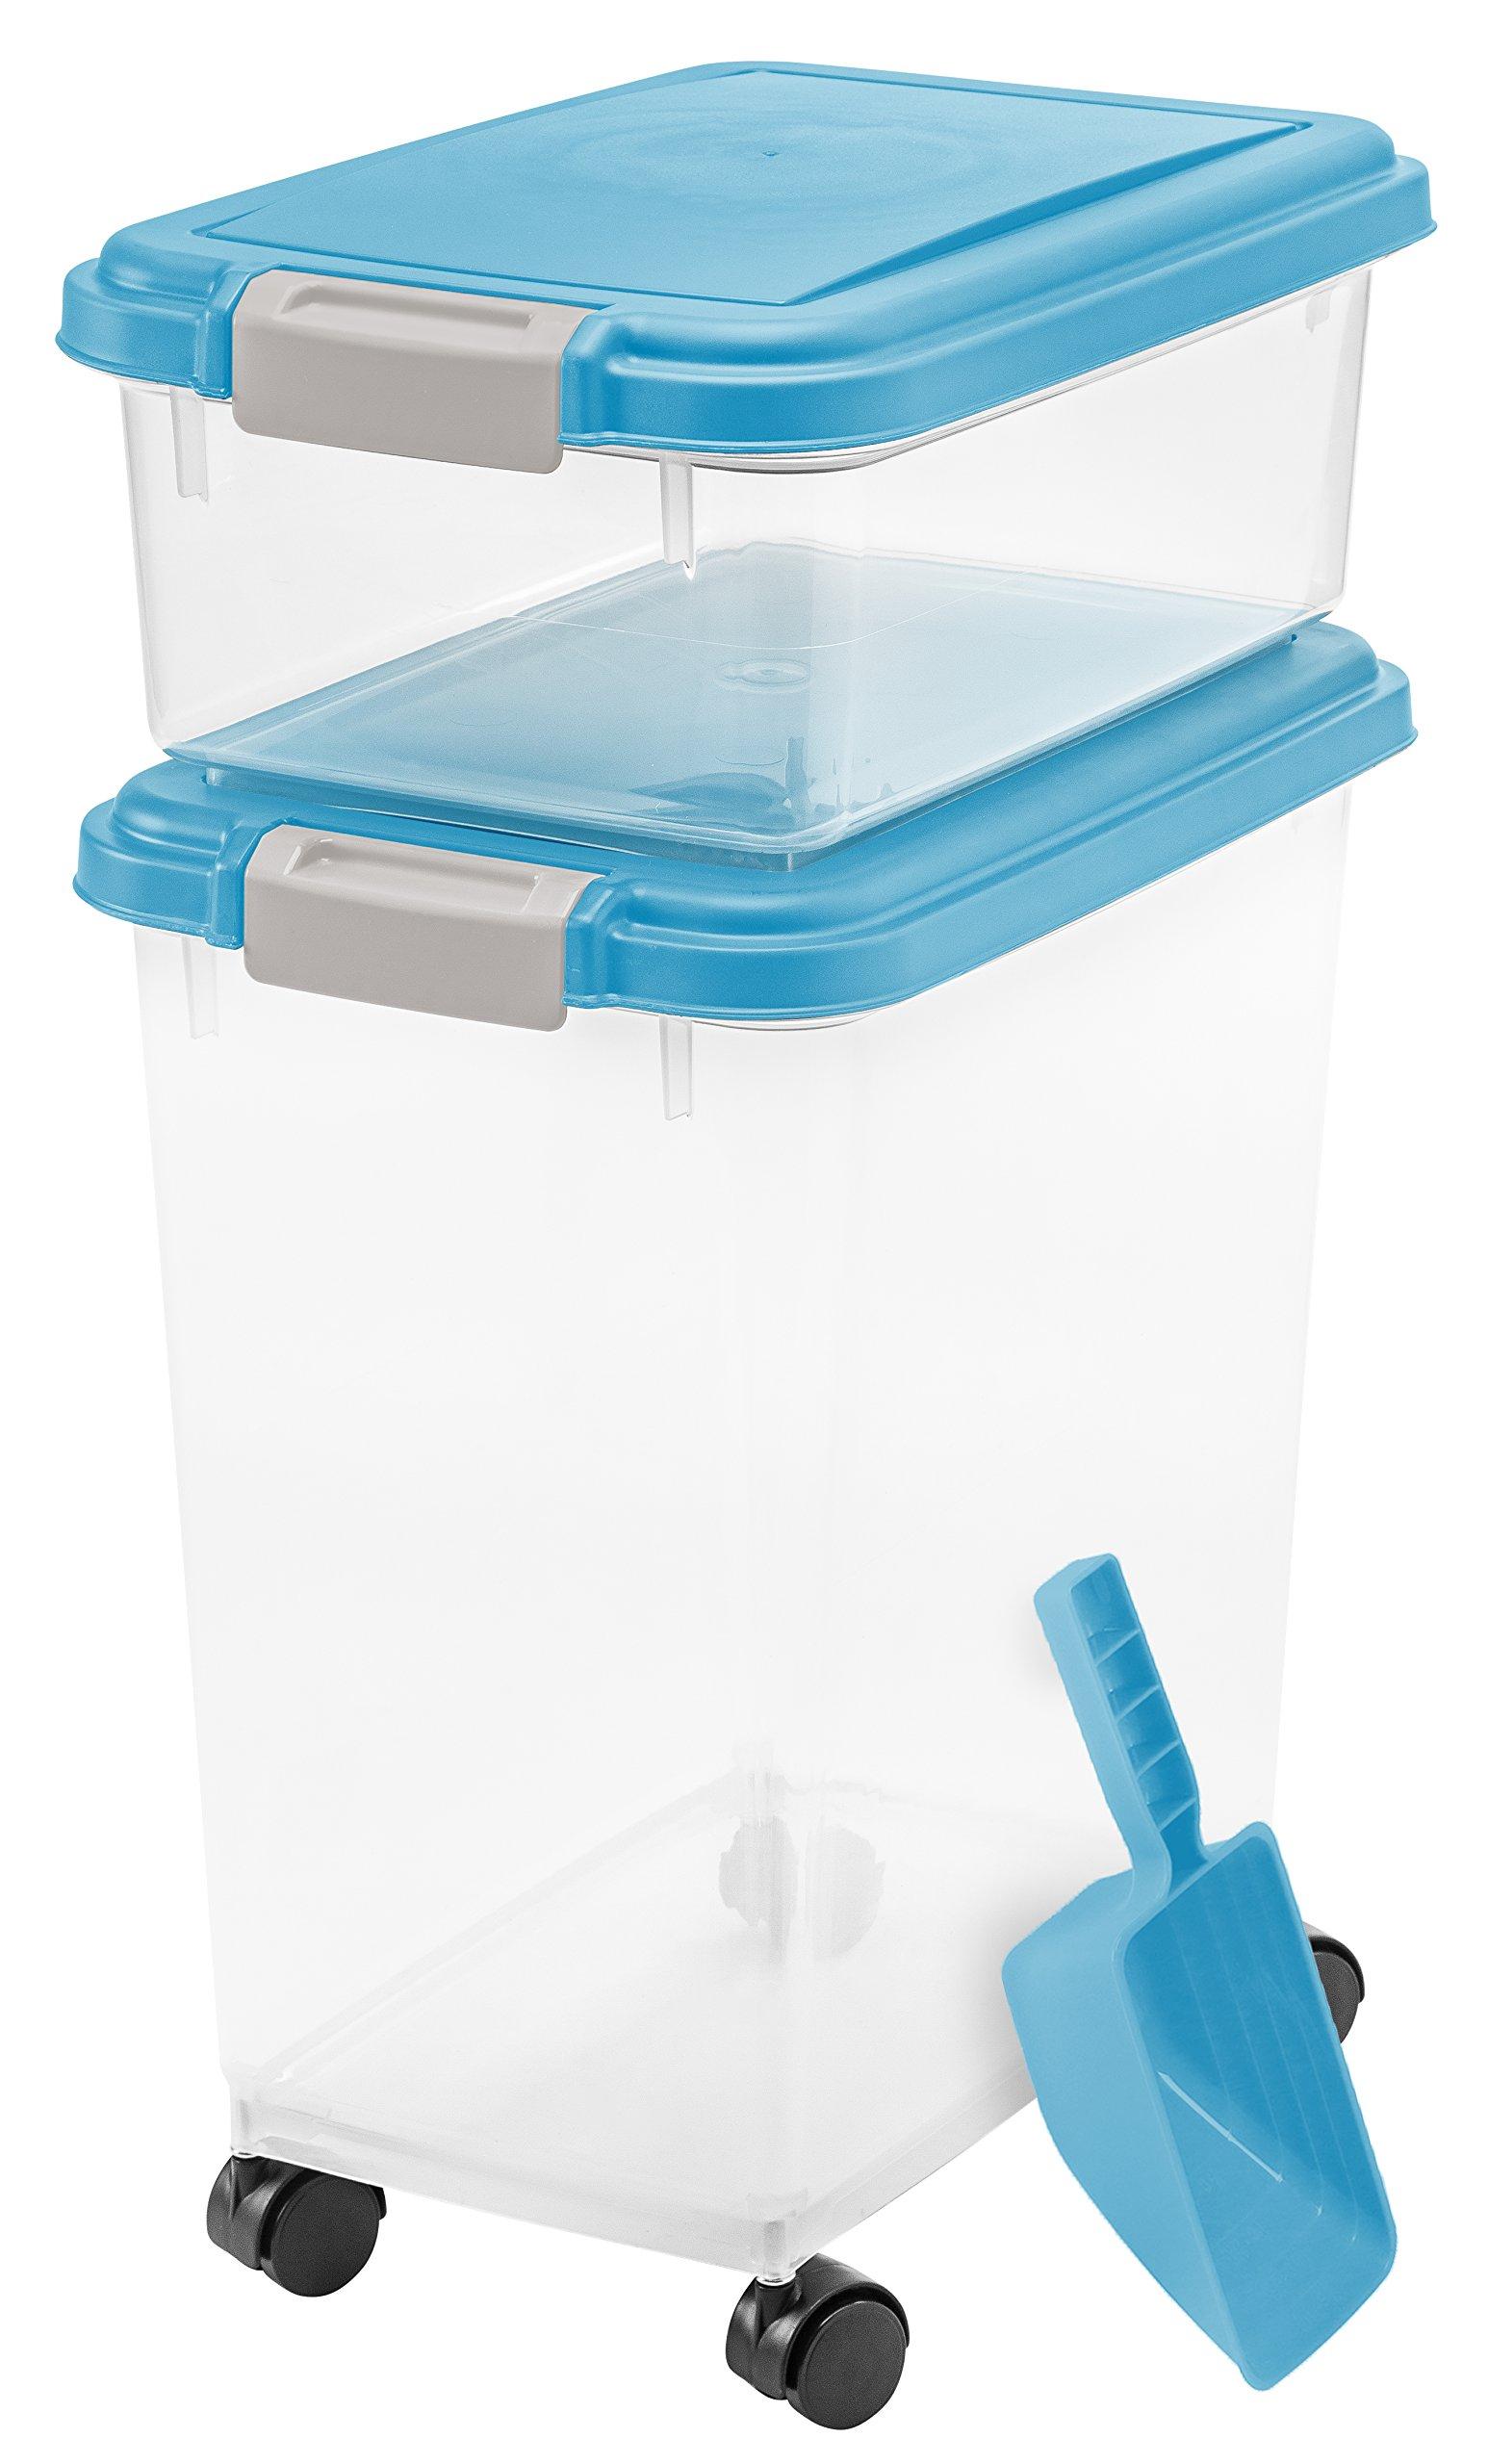 IRIS USA, Inc. 3- Piece Airtight Pet Food Storage Container Combo, Blue Moon by IRIS USA, Inc.